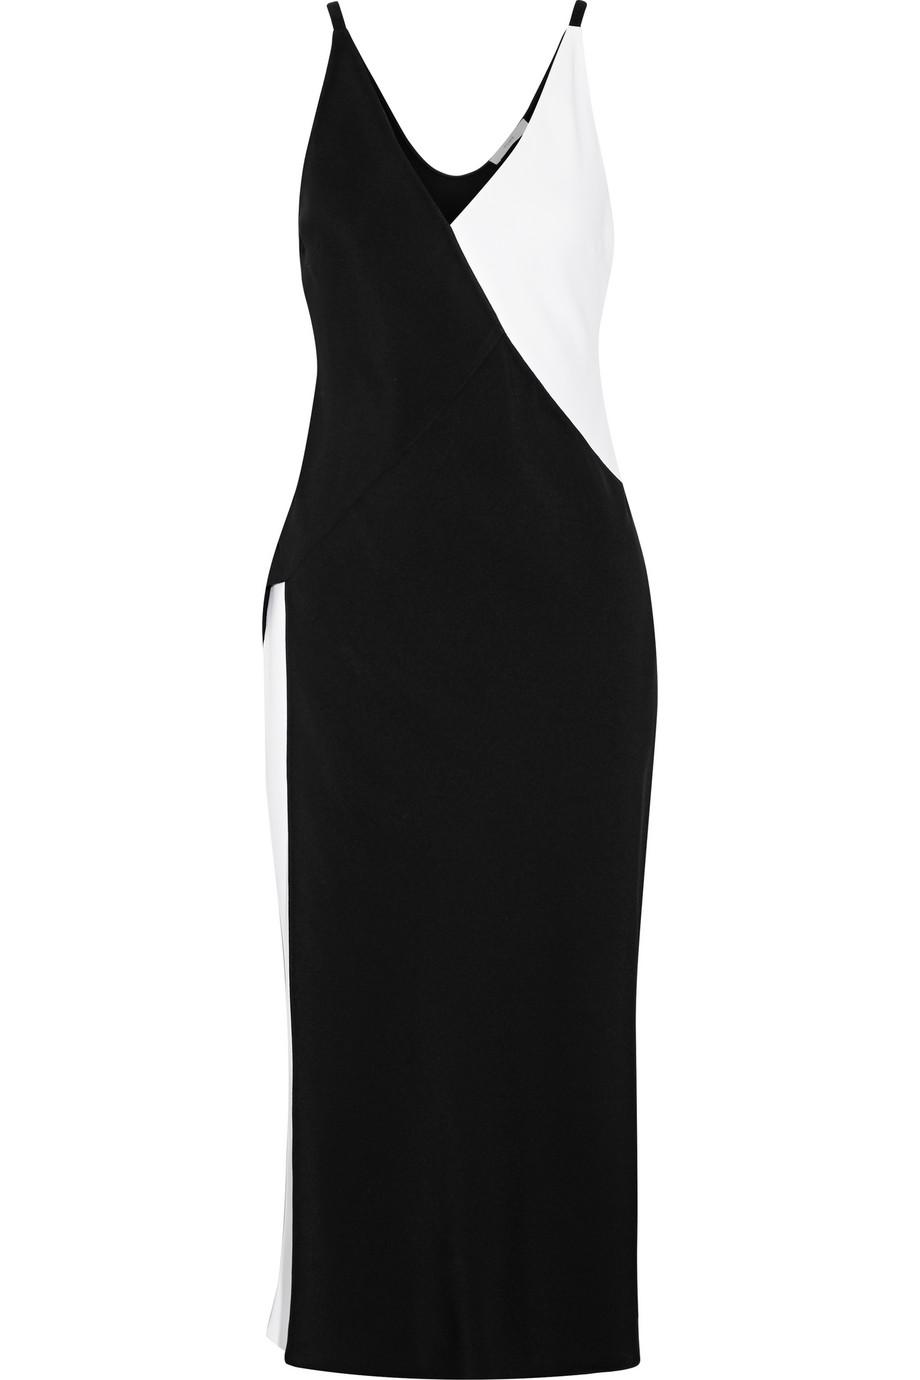 TOME Two-Tone Wrap-Effect Crepe Midi Dress, Size: 8